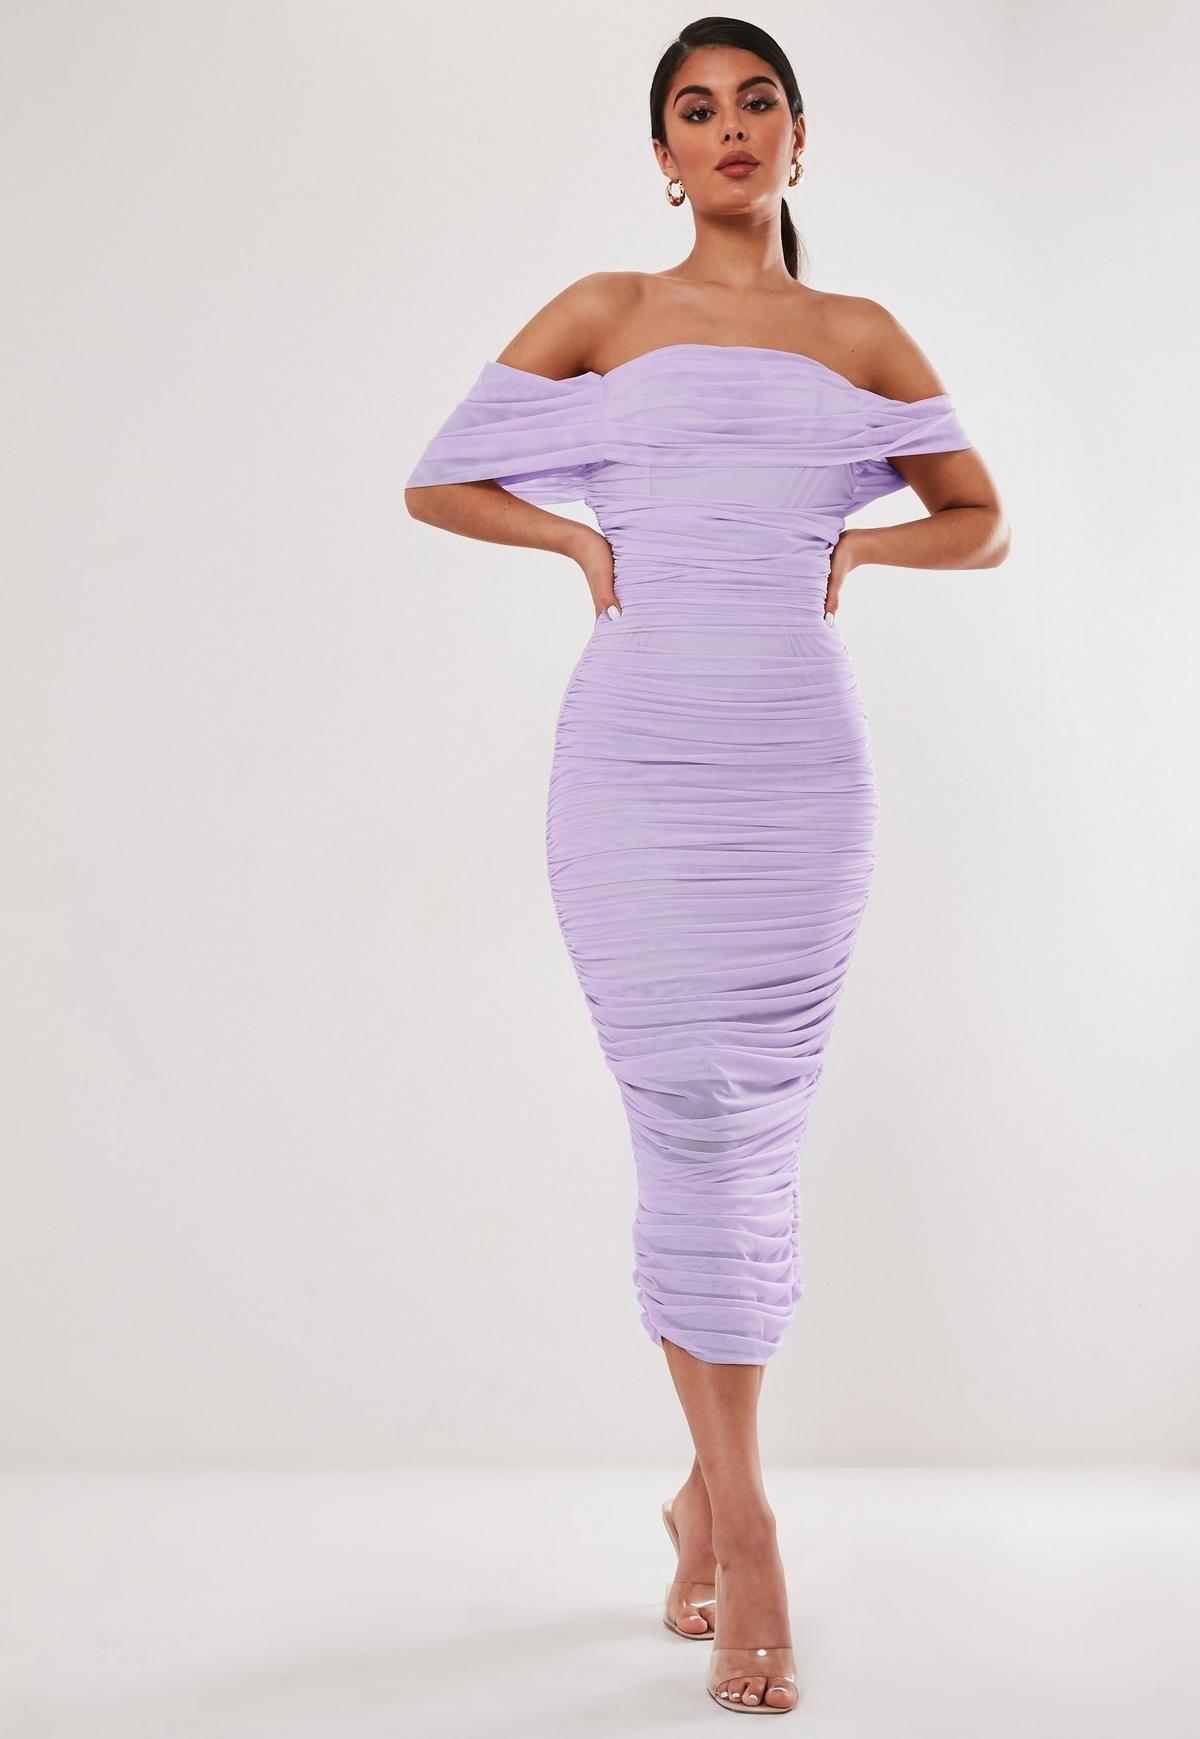 Lilac Mesh Ruched Midi Dress Pink Bodycon Midi Dress Lilac Midi Dress Ruched Midi Dress [ 1739 x 1200 Pixel ]